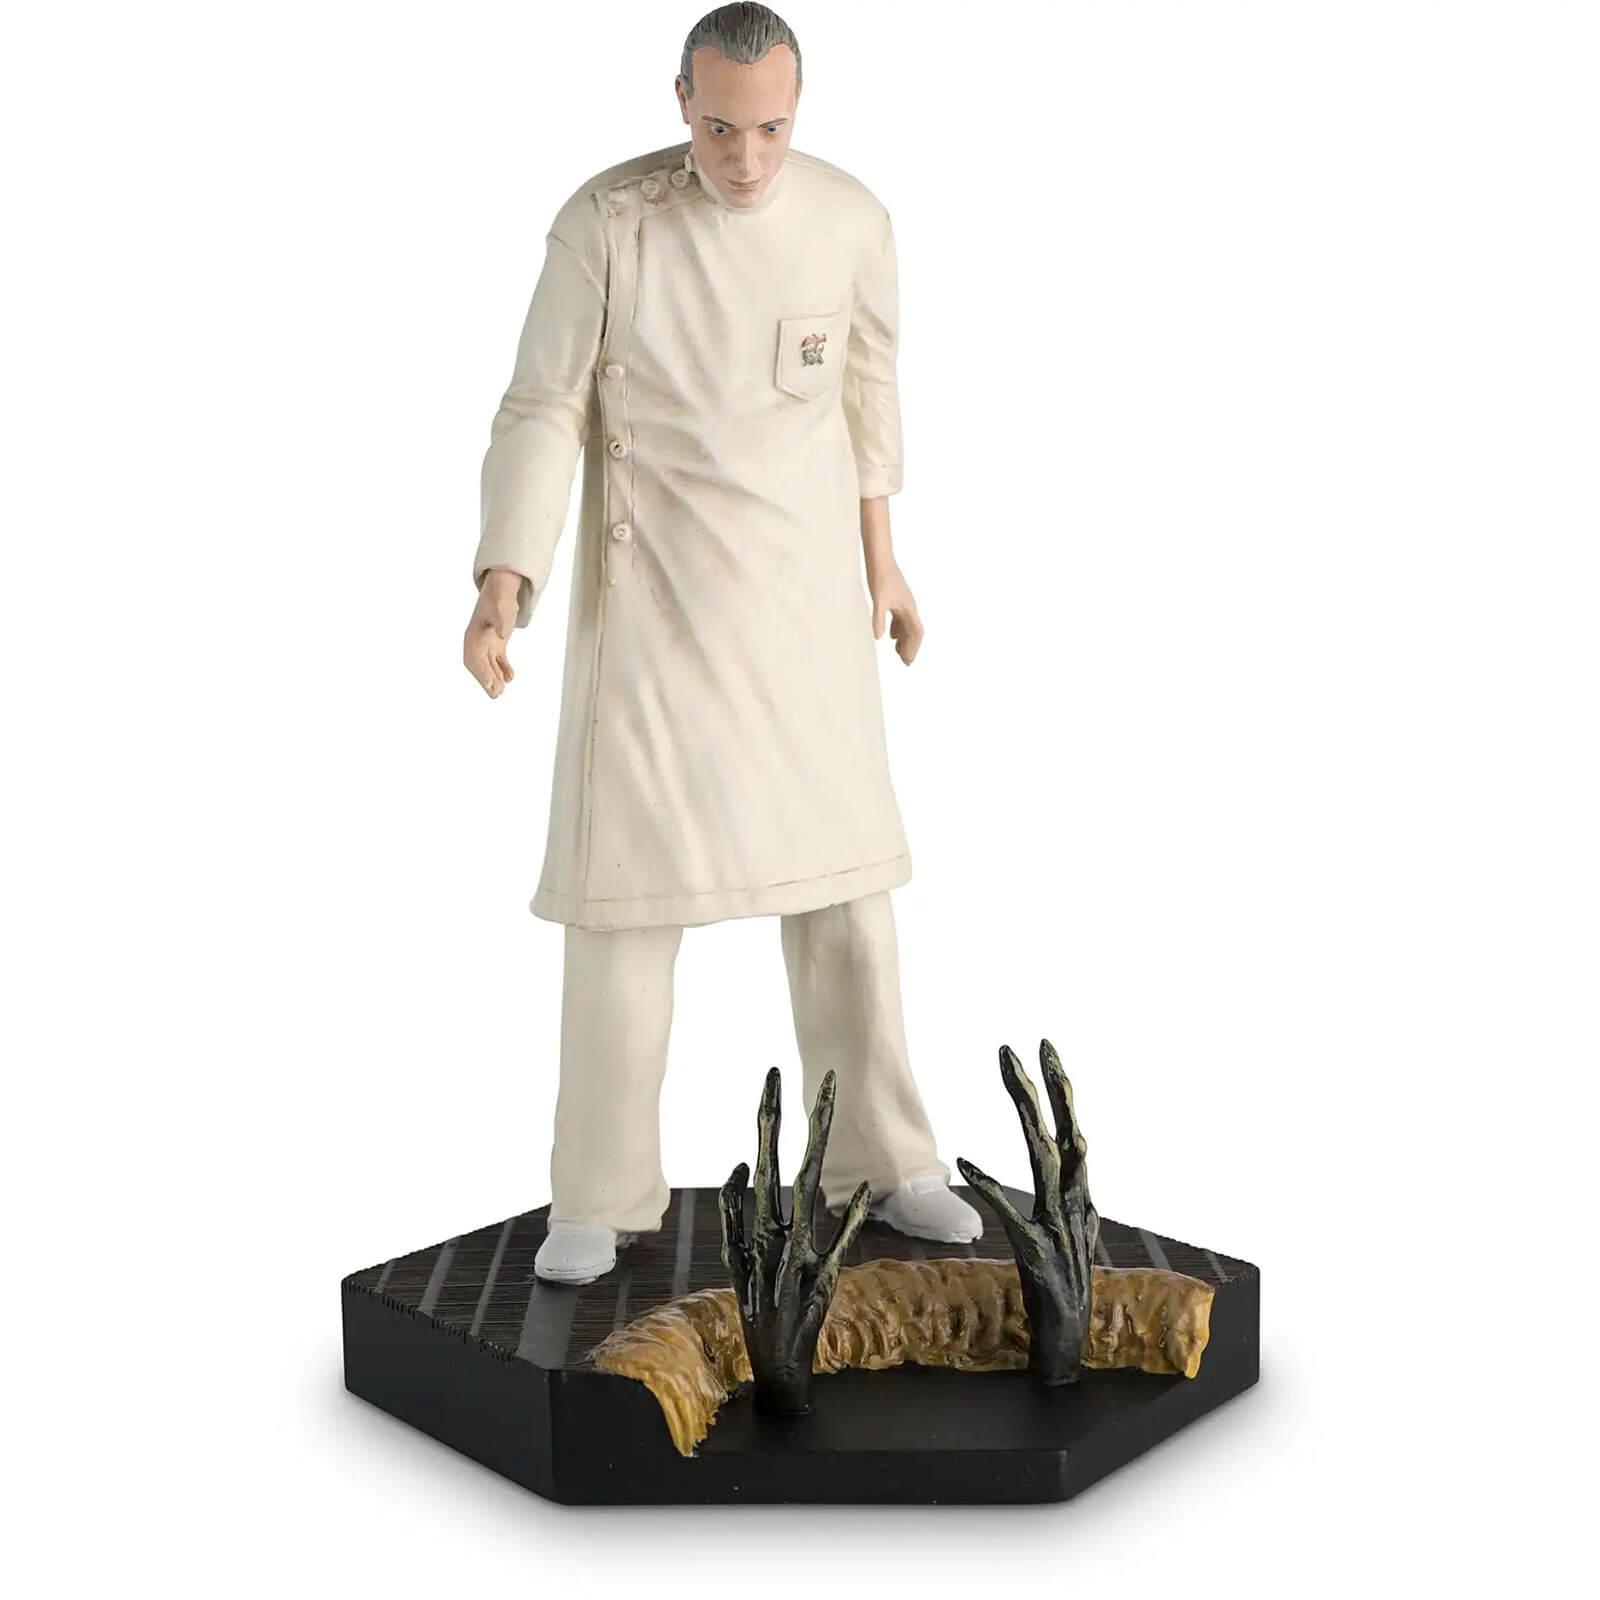 Eaglemoss Figure Collection - Alien Doctor Gediman Figurine (Alien: Resurrection)